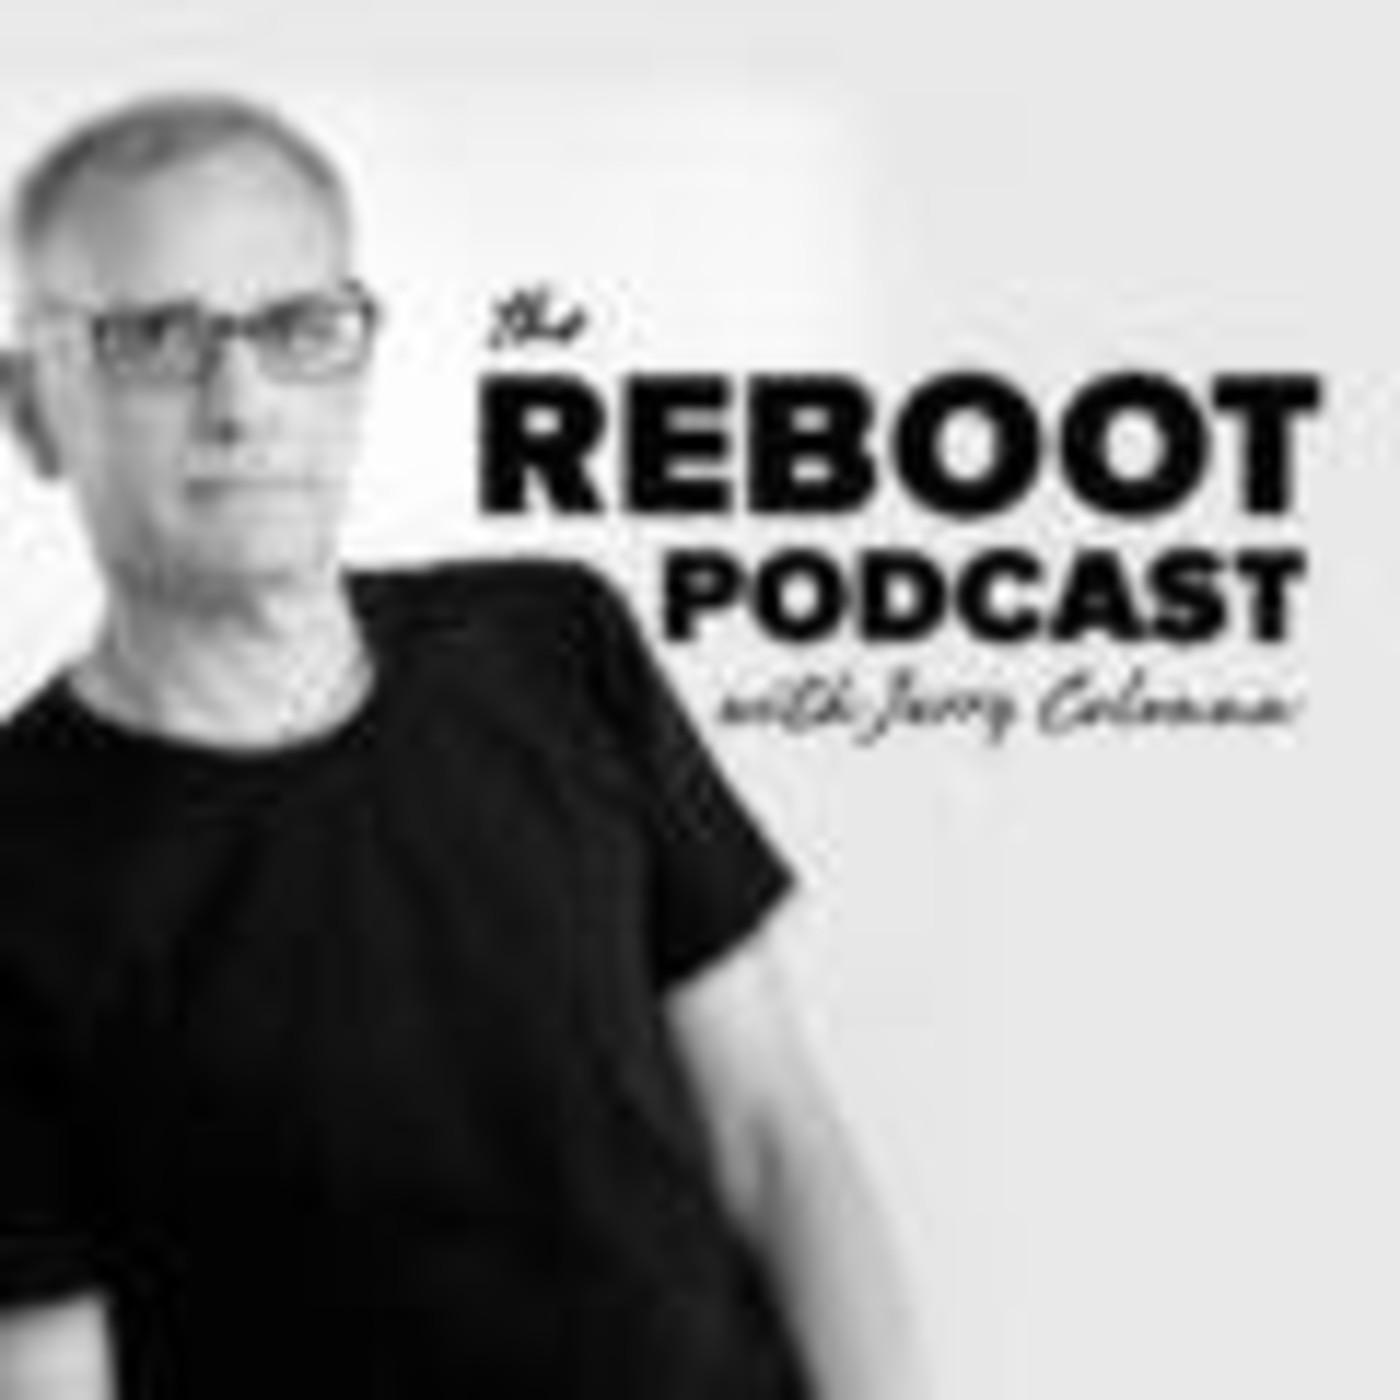 Jerry Colonna - Reboot.io